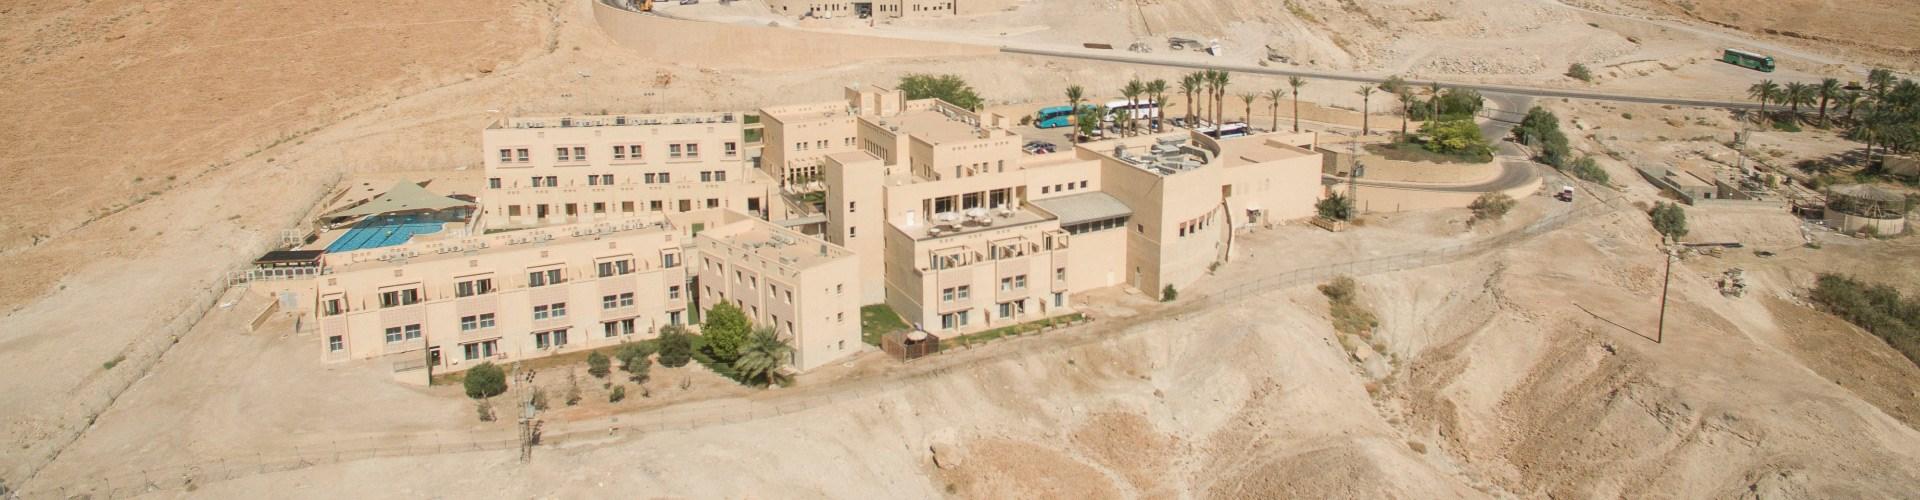 HI Masada